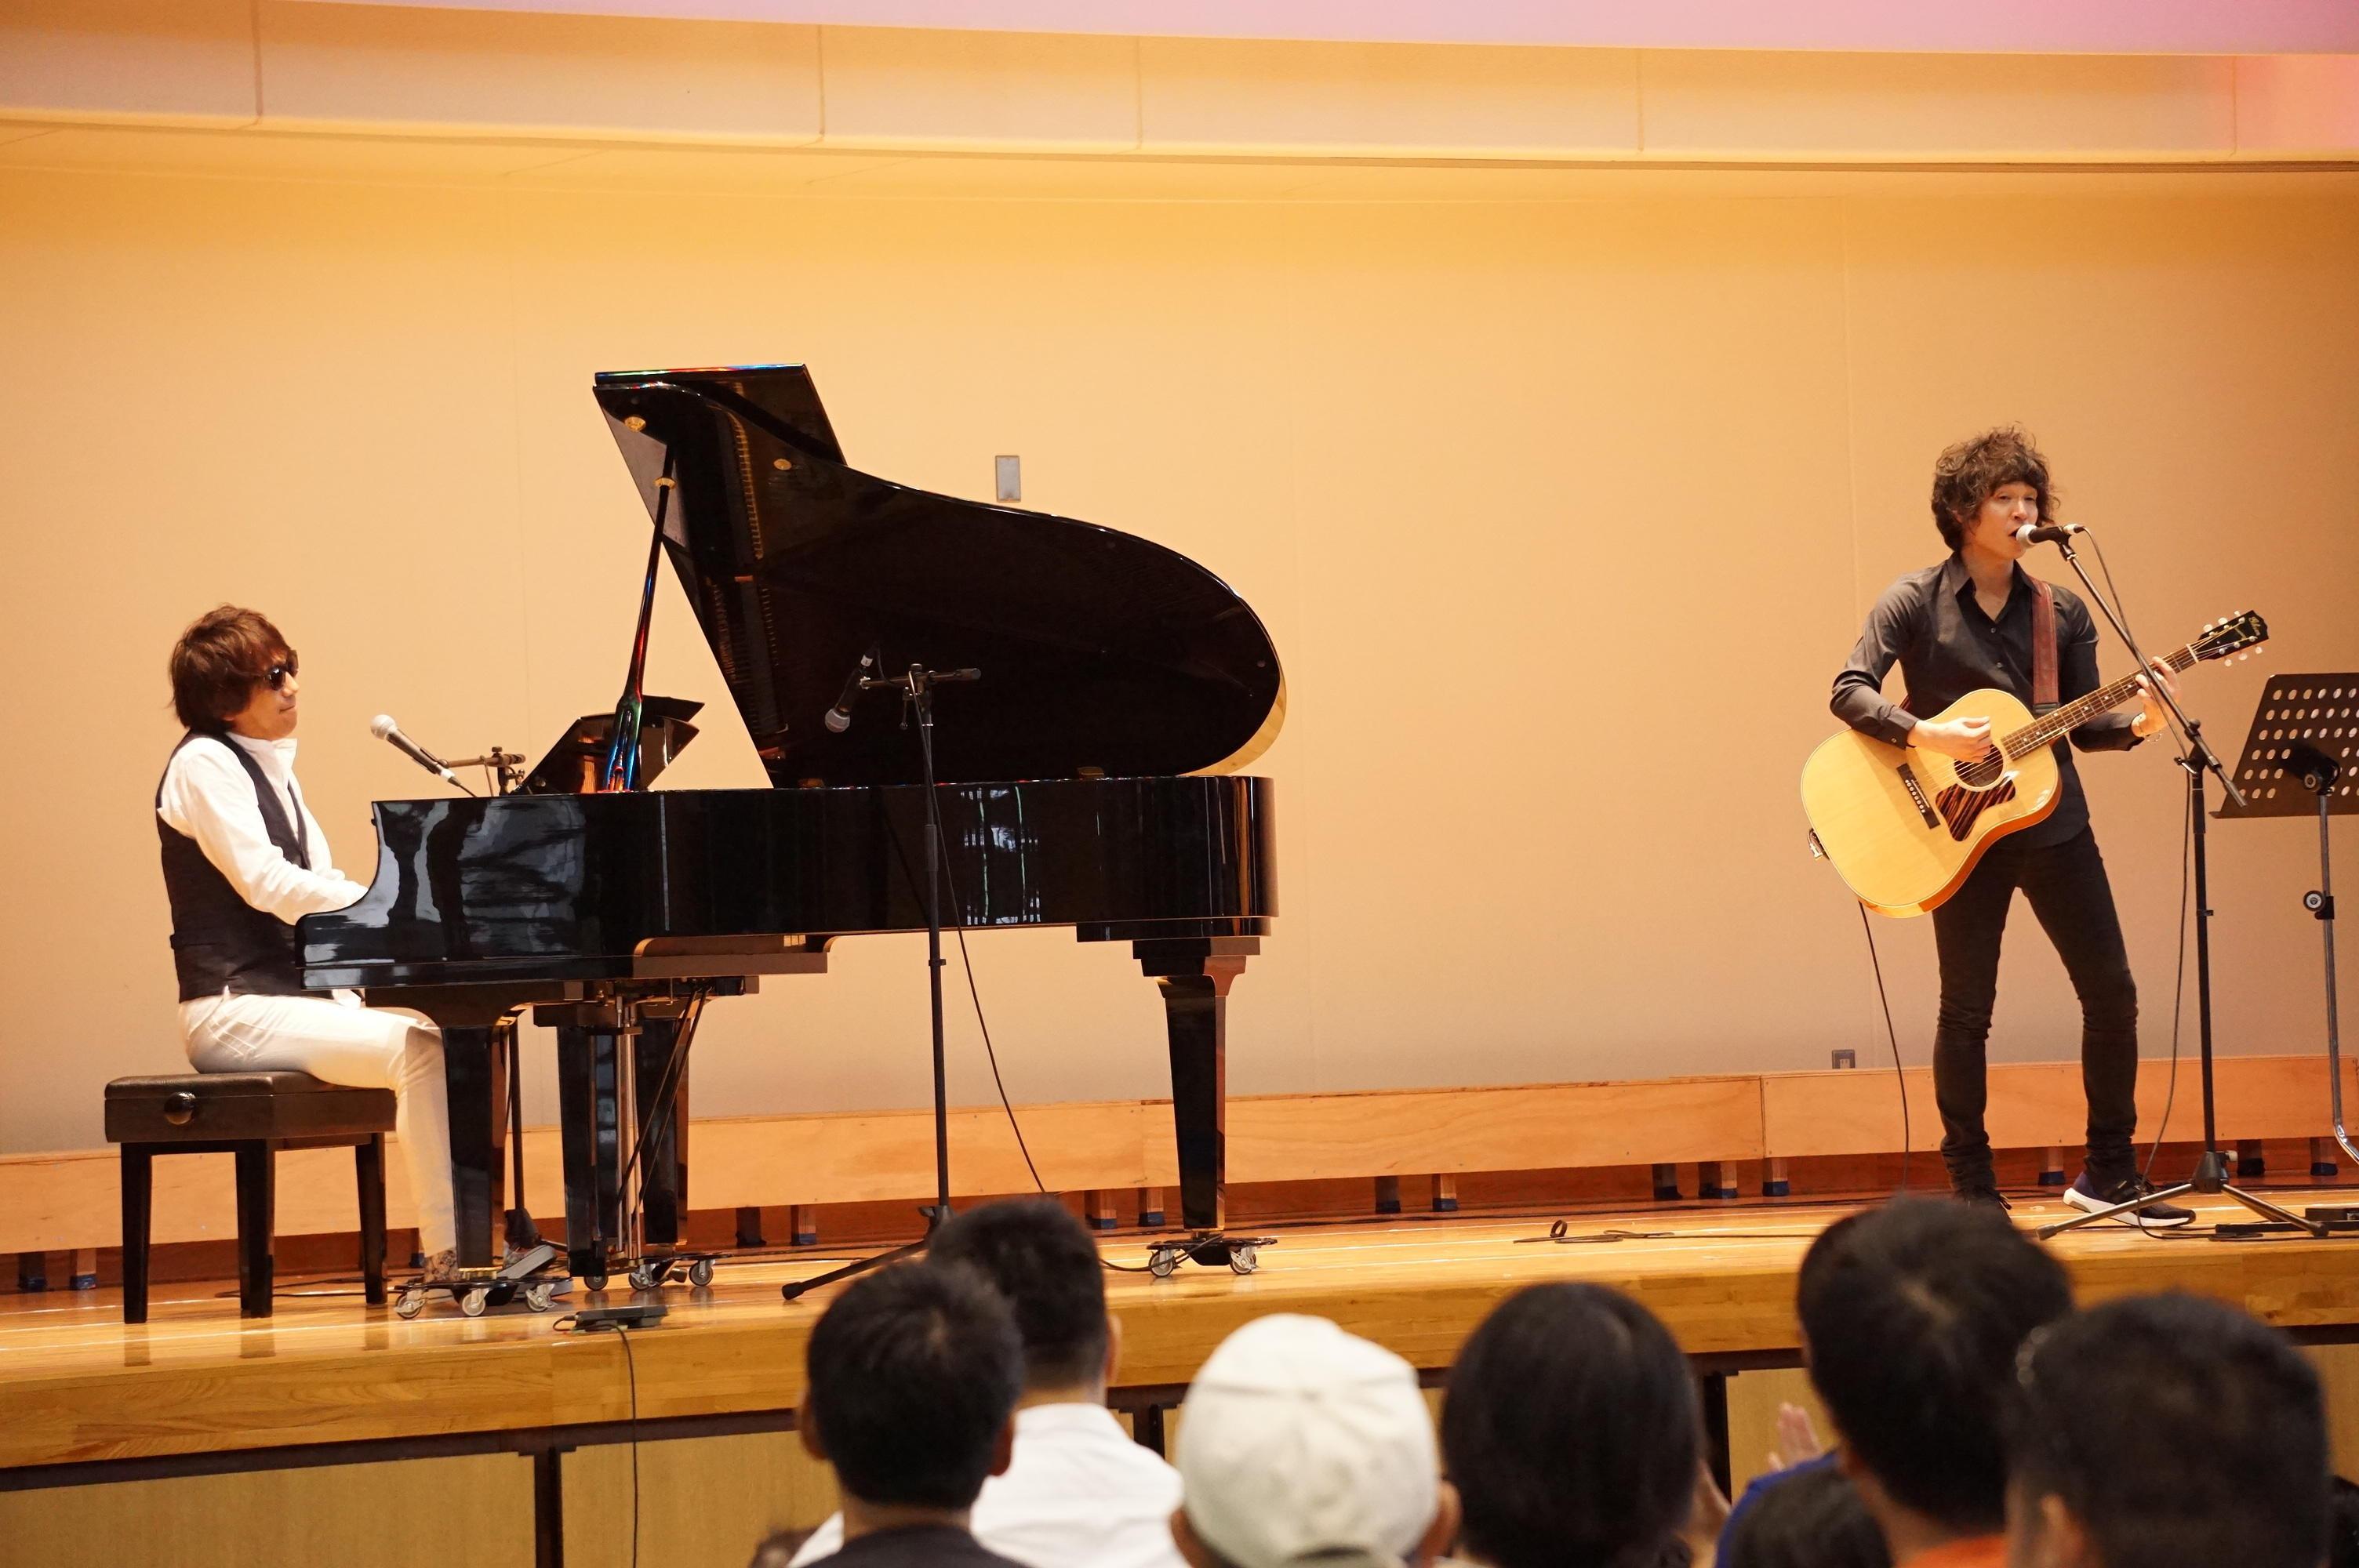 http://news.yoshimoto.co.jp/20161121153846-967eb80b694ffa768e20bd8f36452367983283ca.jpg